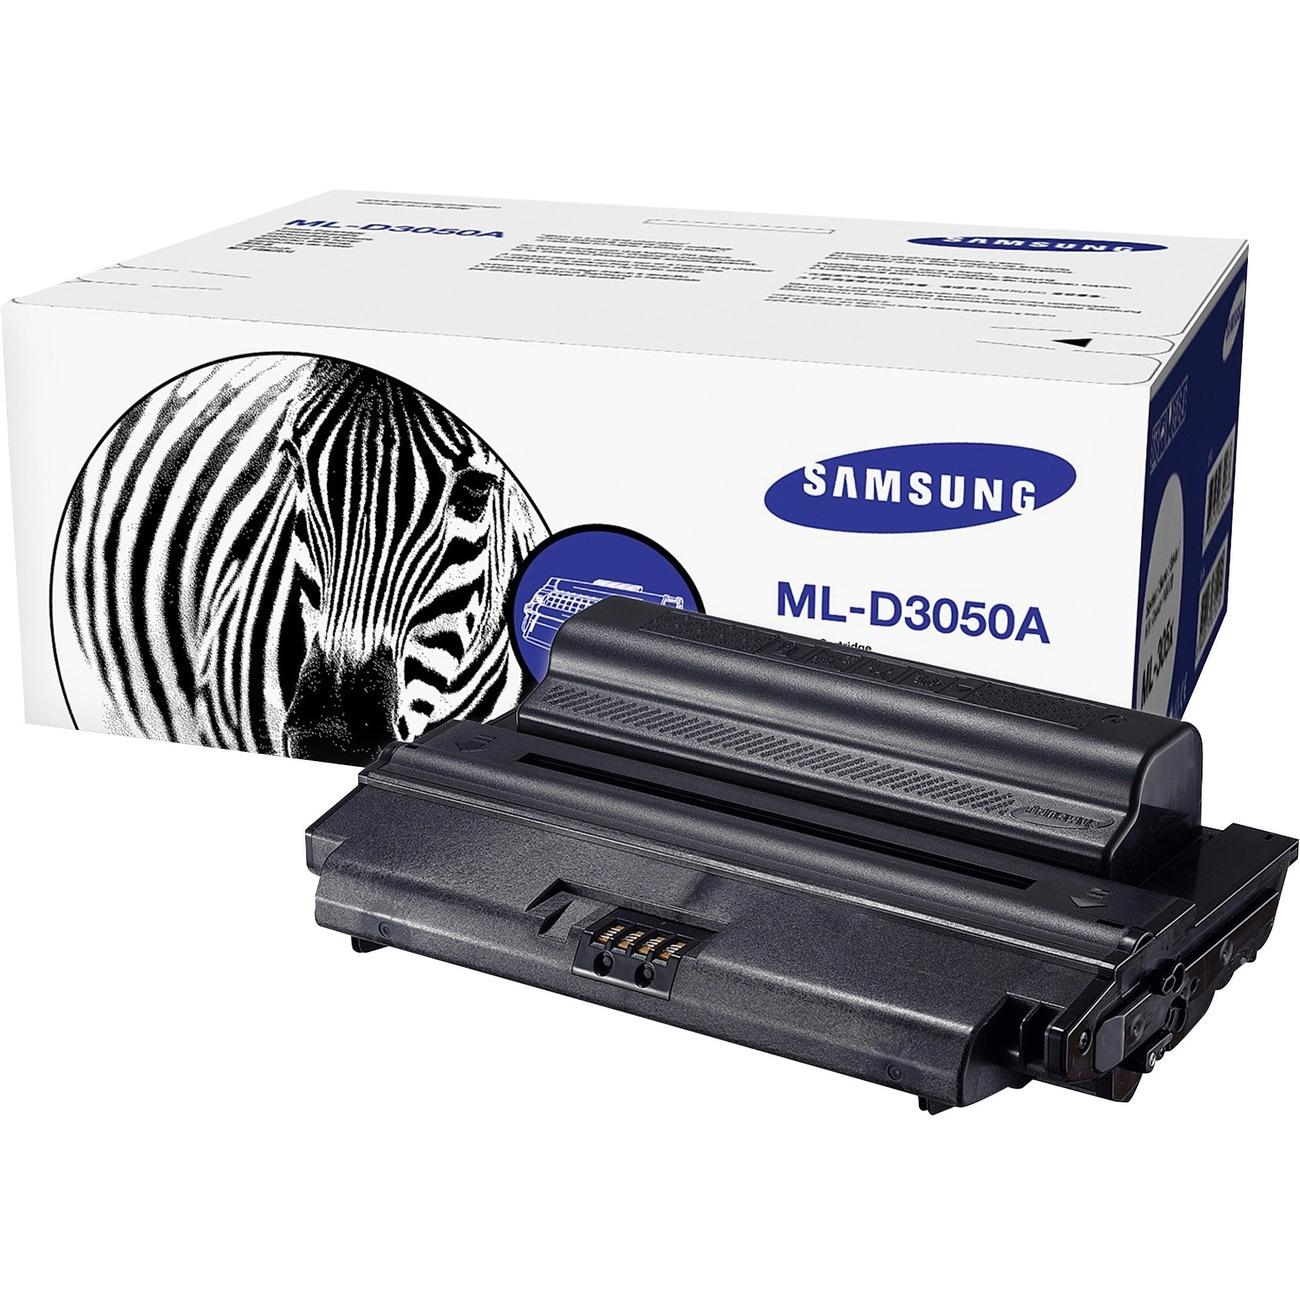 Samsung ML-D3050A Black Toner Cartridge